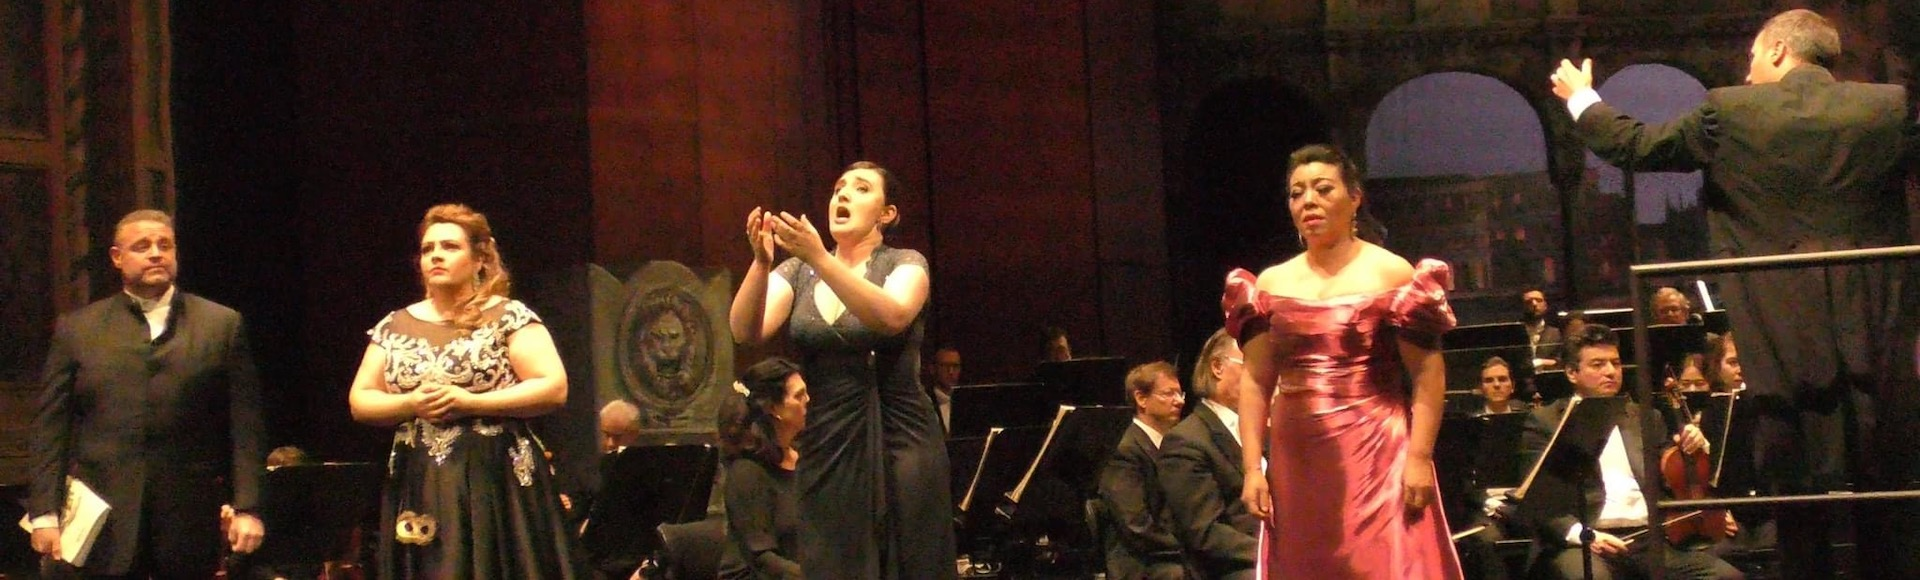 On stage with fellow soloists in La Gioconda, Deustche Oper Berlin, 2020, (photo credit: Helmut Fischer)